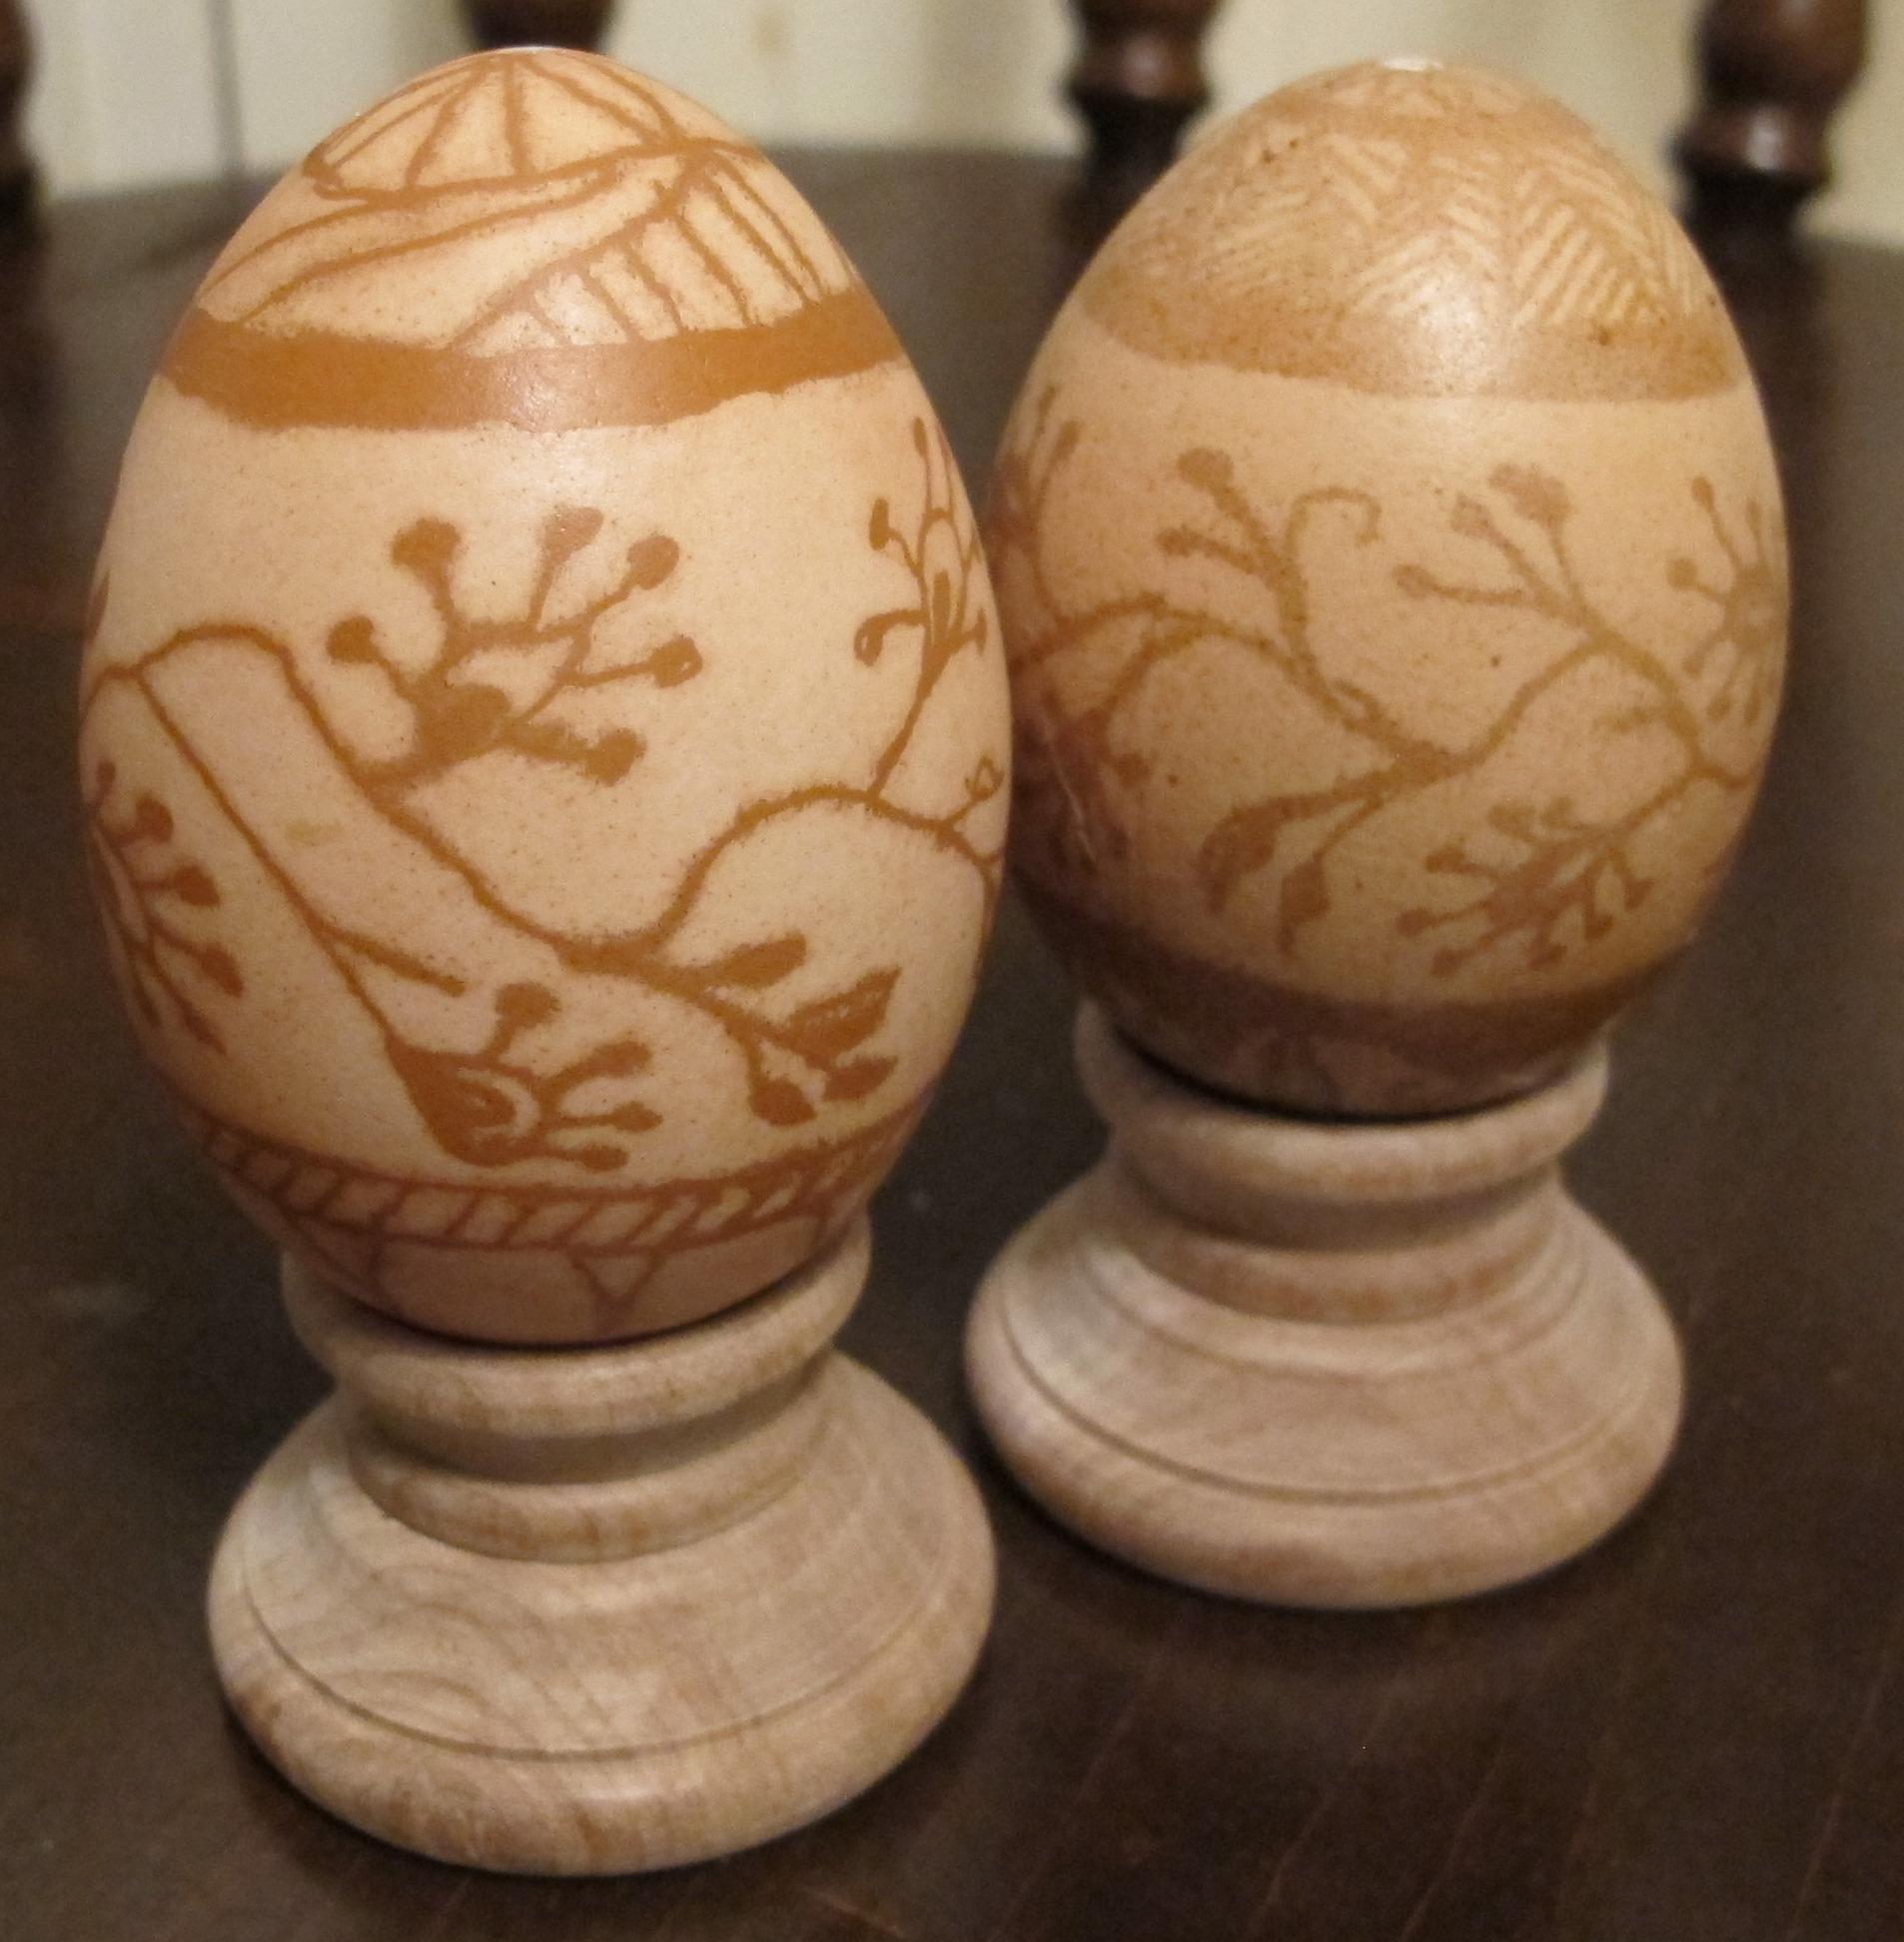 Making Wax-resist Eggs (Pysanky) in Soft Brown Shades